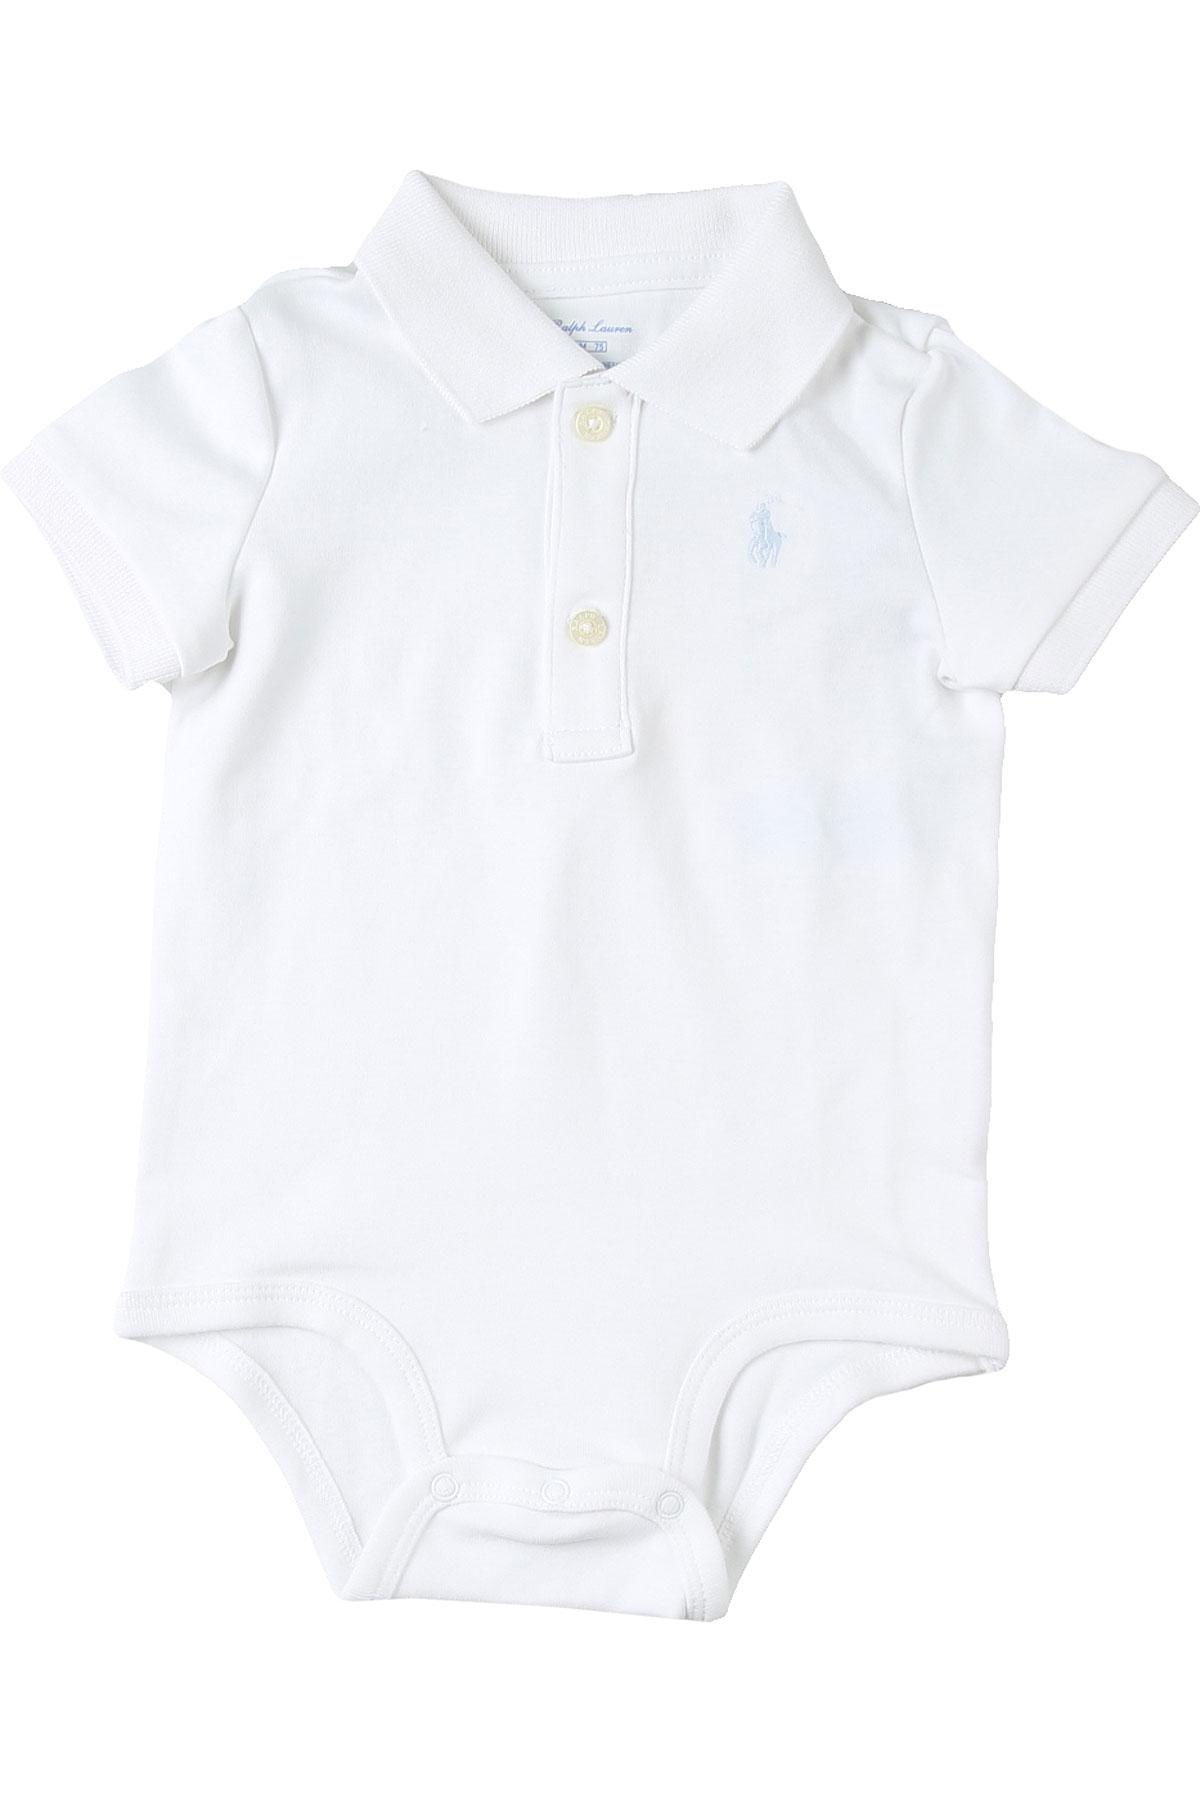 Ralph Lauren Baby Bodysuits & Onesies for Boys On Sale, White, polyester, 2019, 3M 6M 9M